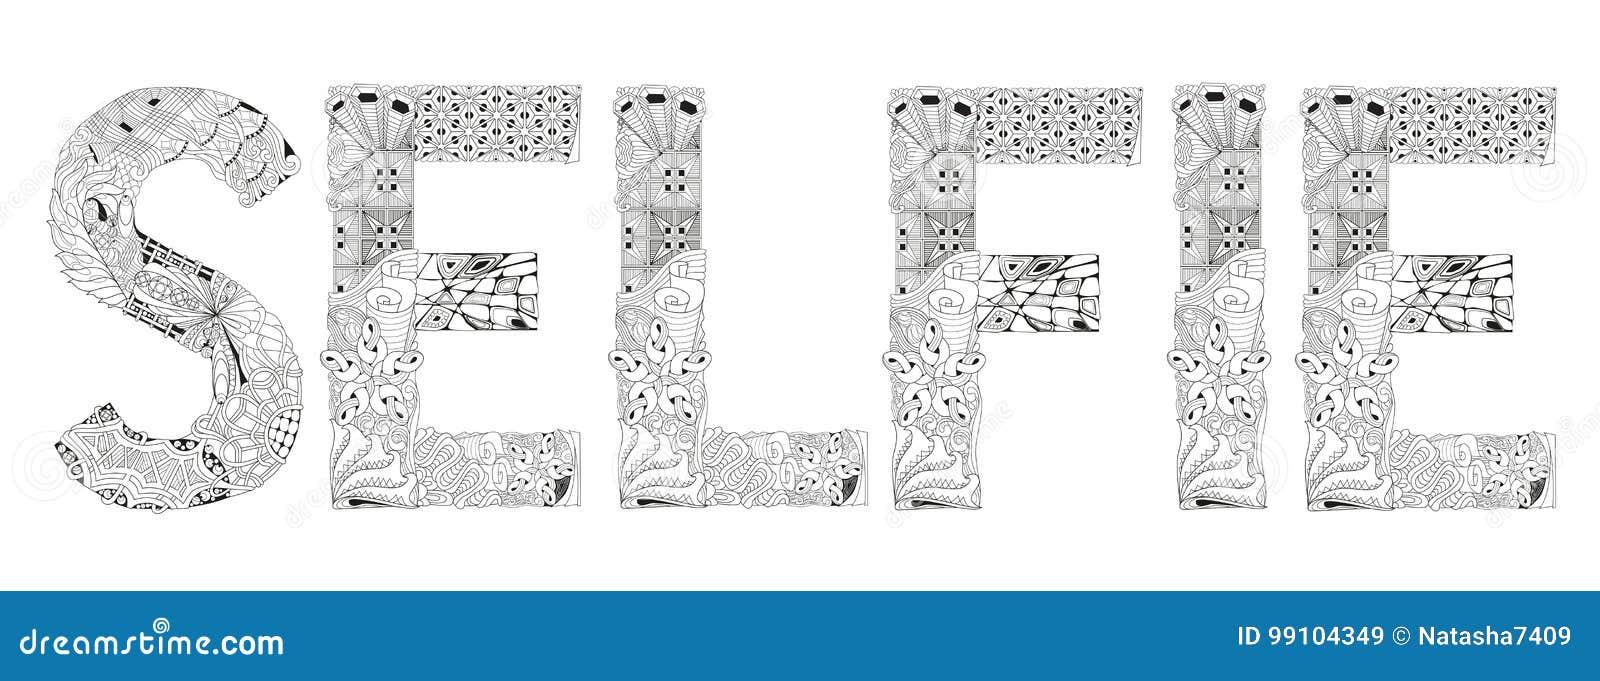 Palabra SELFIE Para Colorear Objeto Decorativo Del Zentangle Del ...